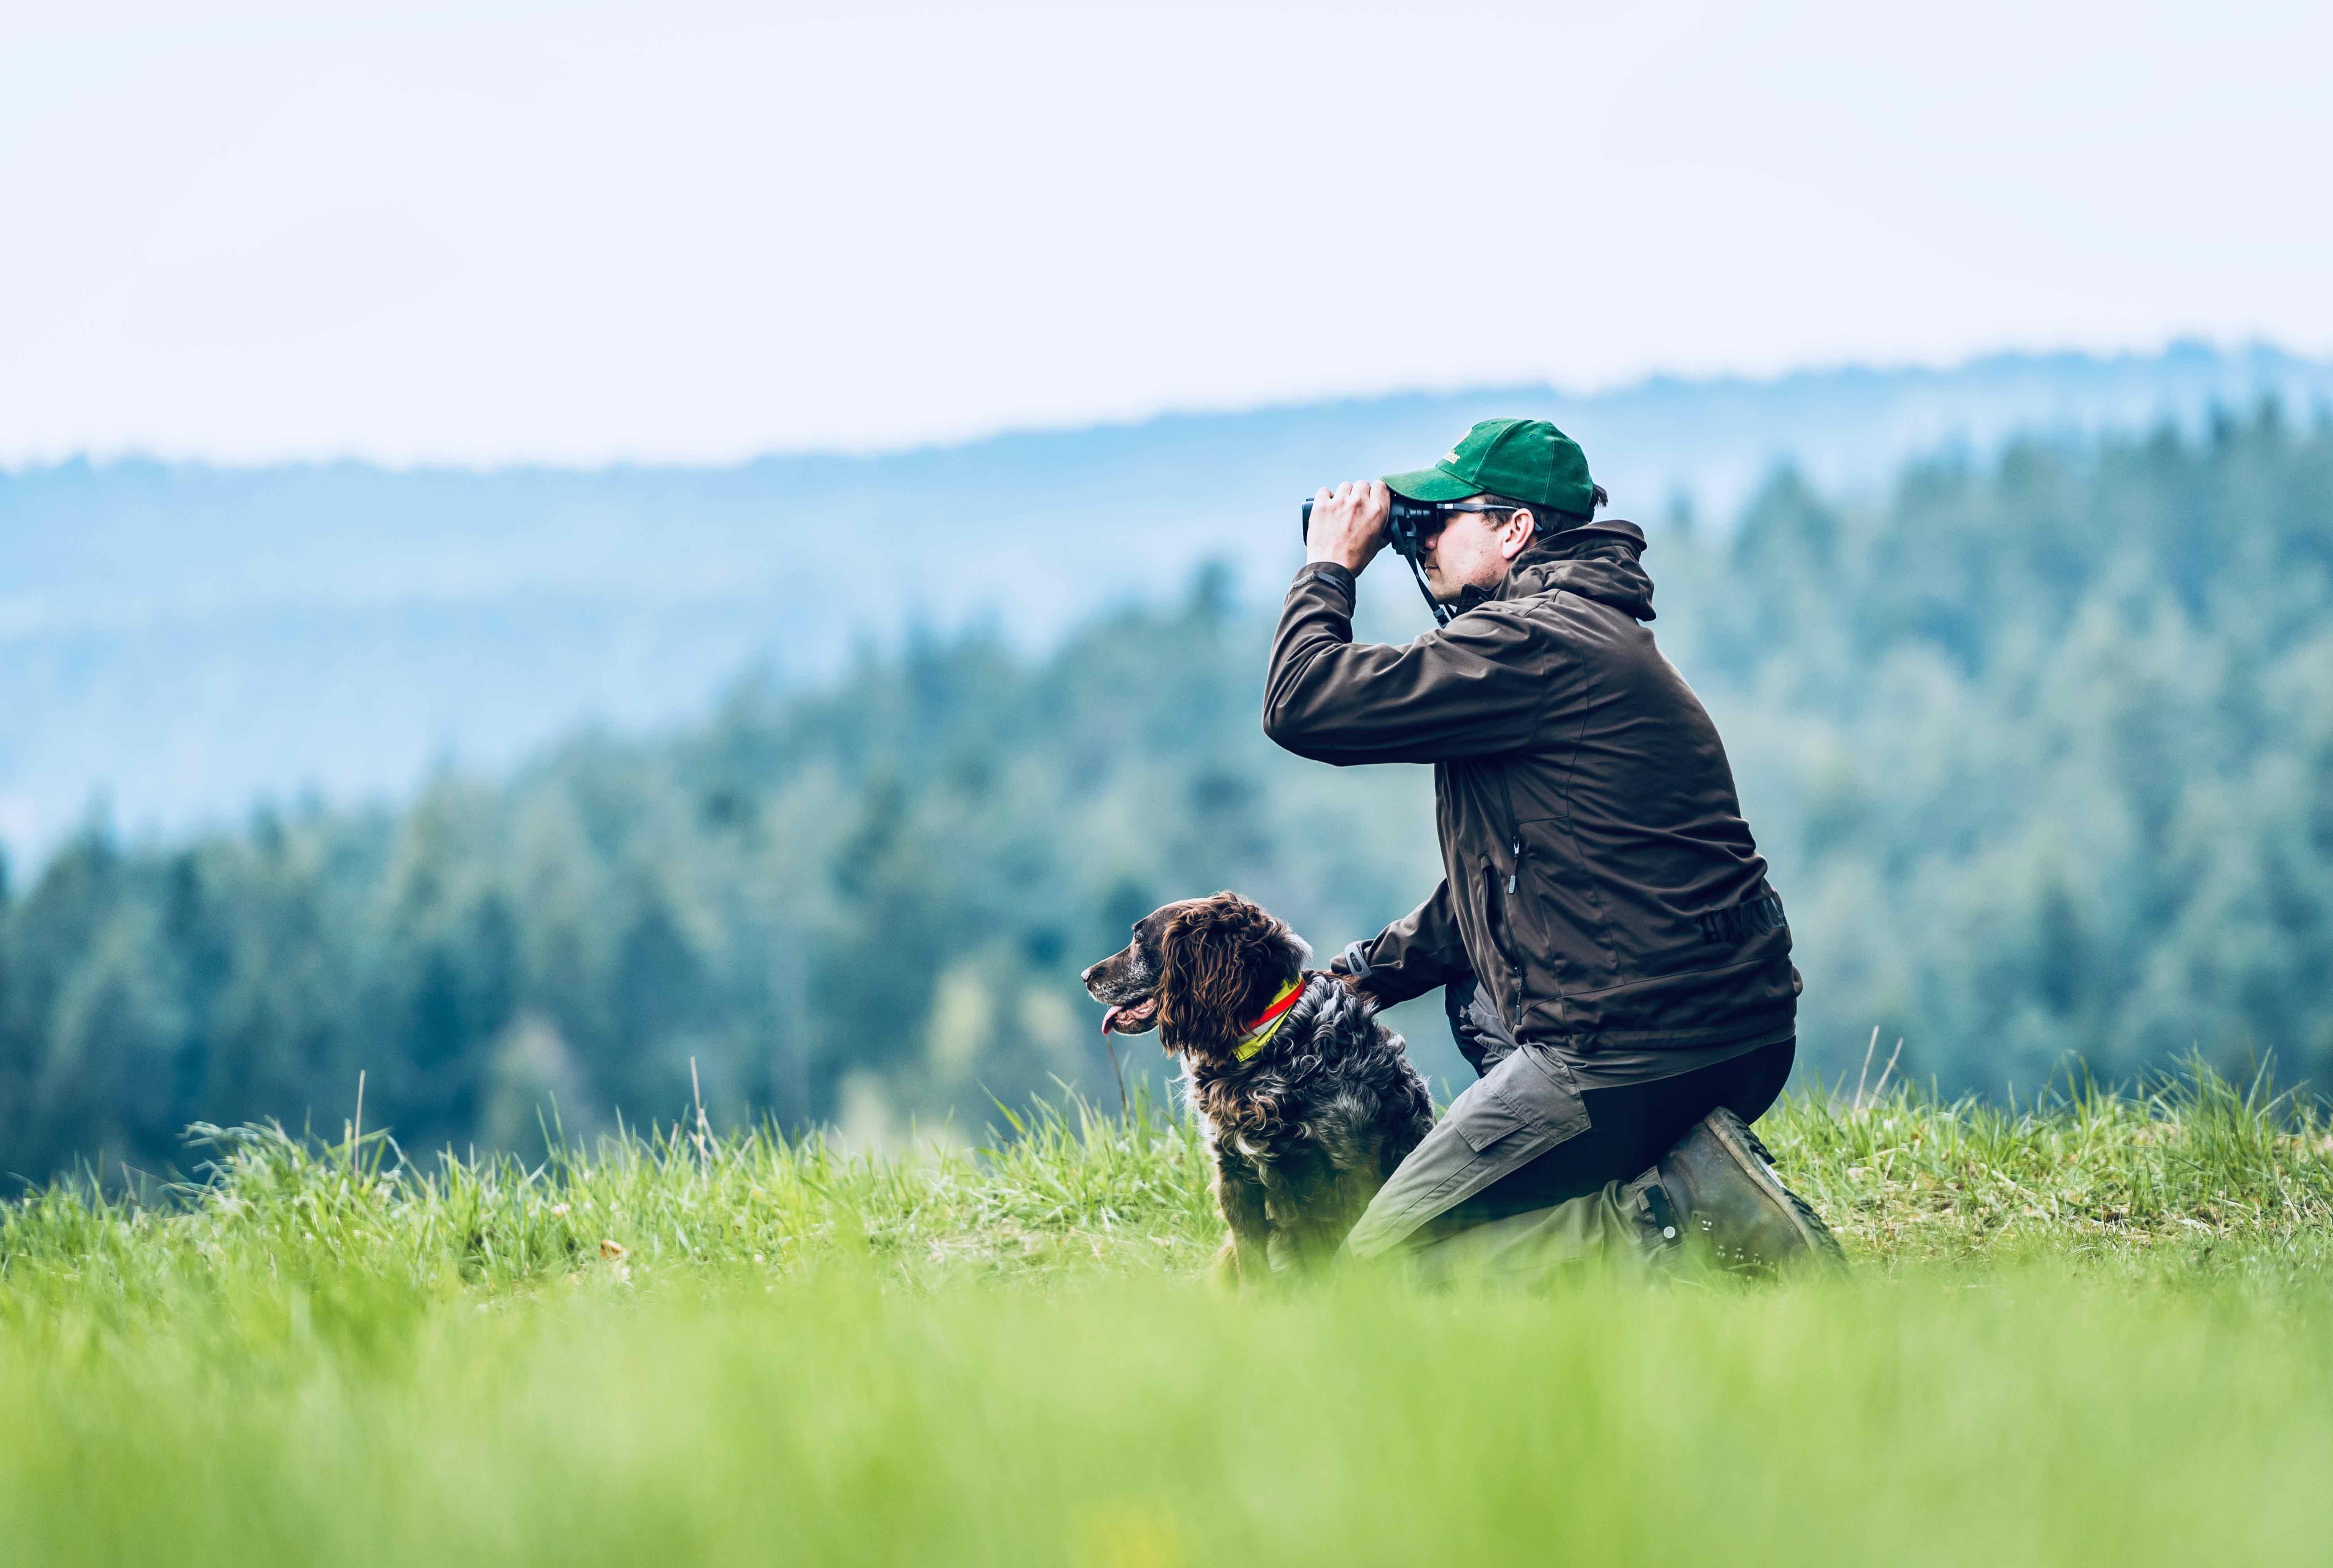 Jäger mit Hund quo vadis Friedenfelser